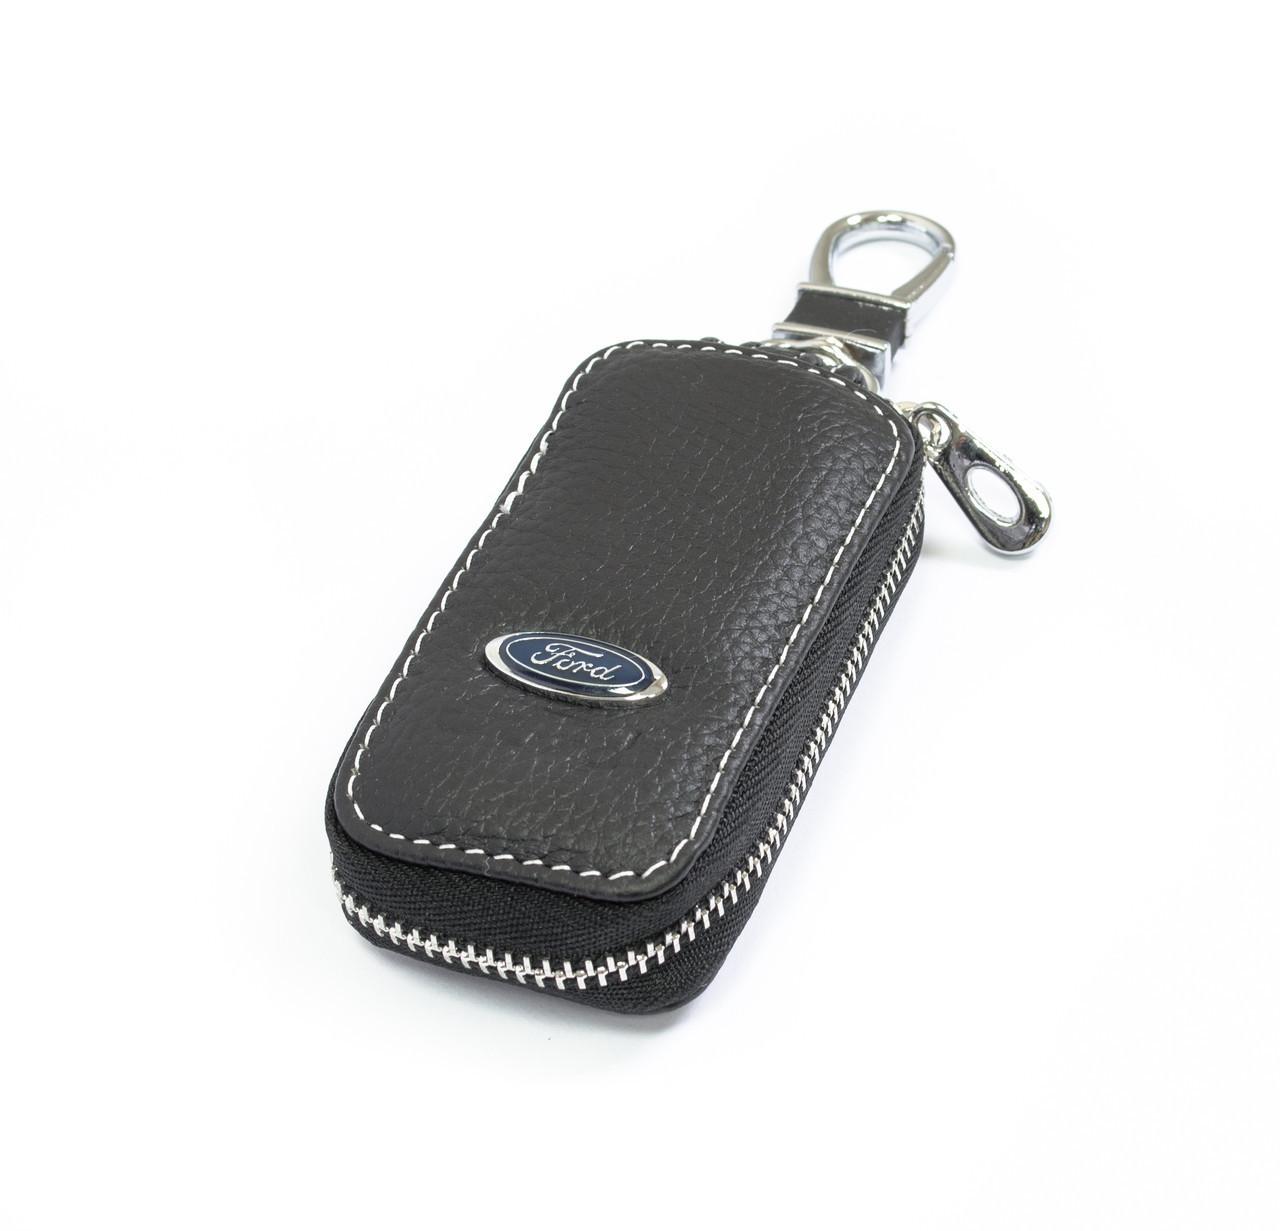 Ключница Carss с логотипом FORD 03010 черная